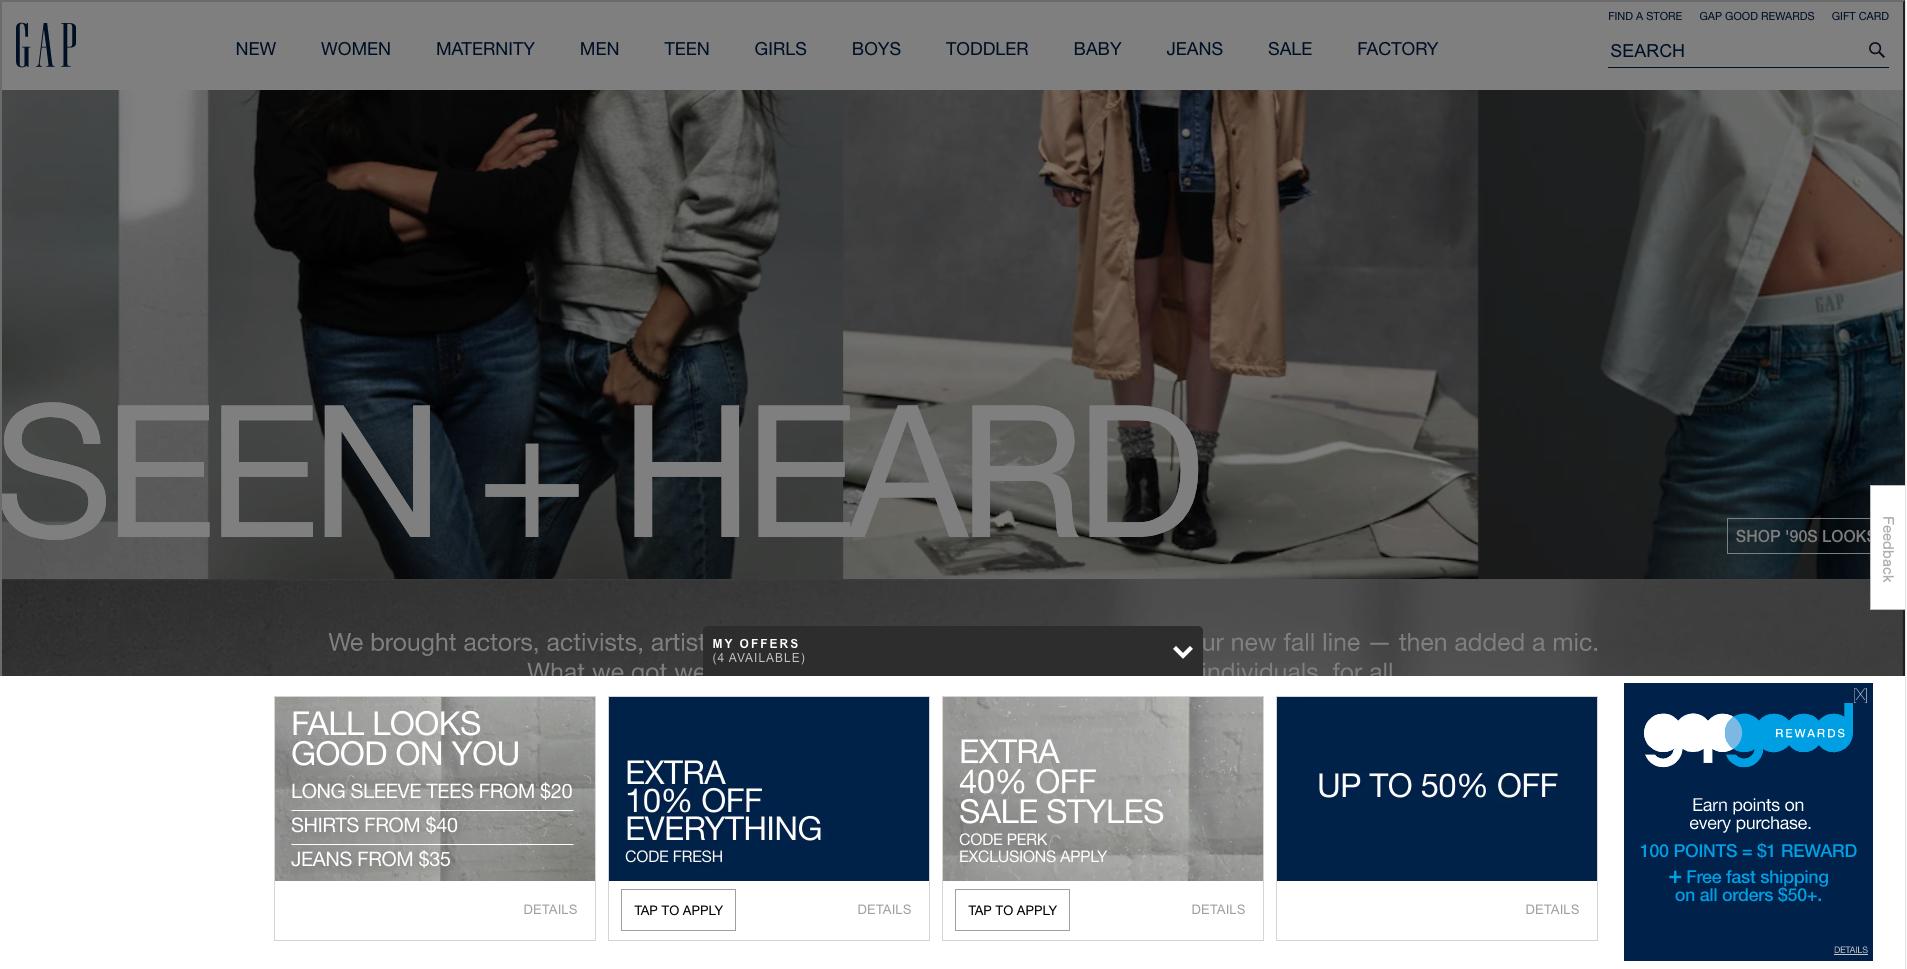 Gap website